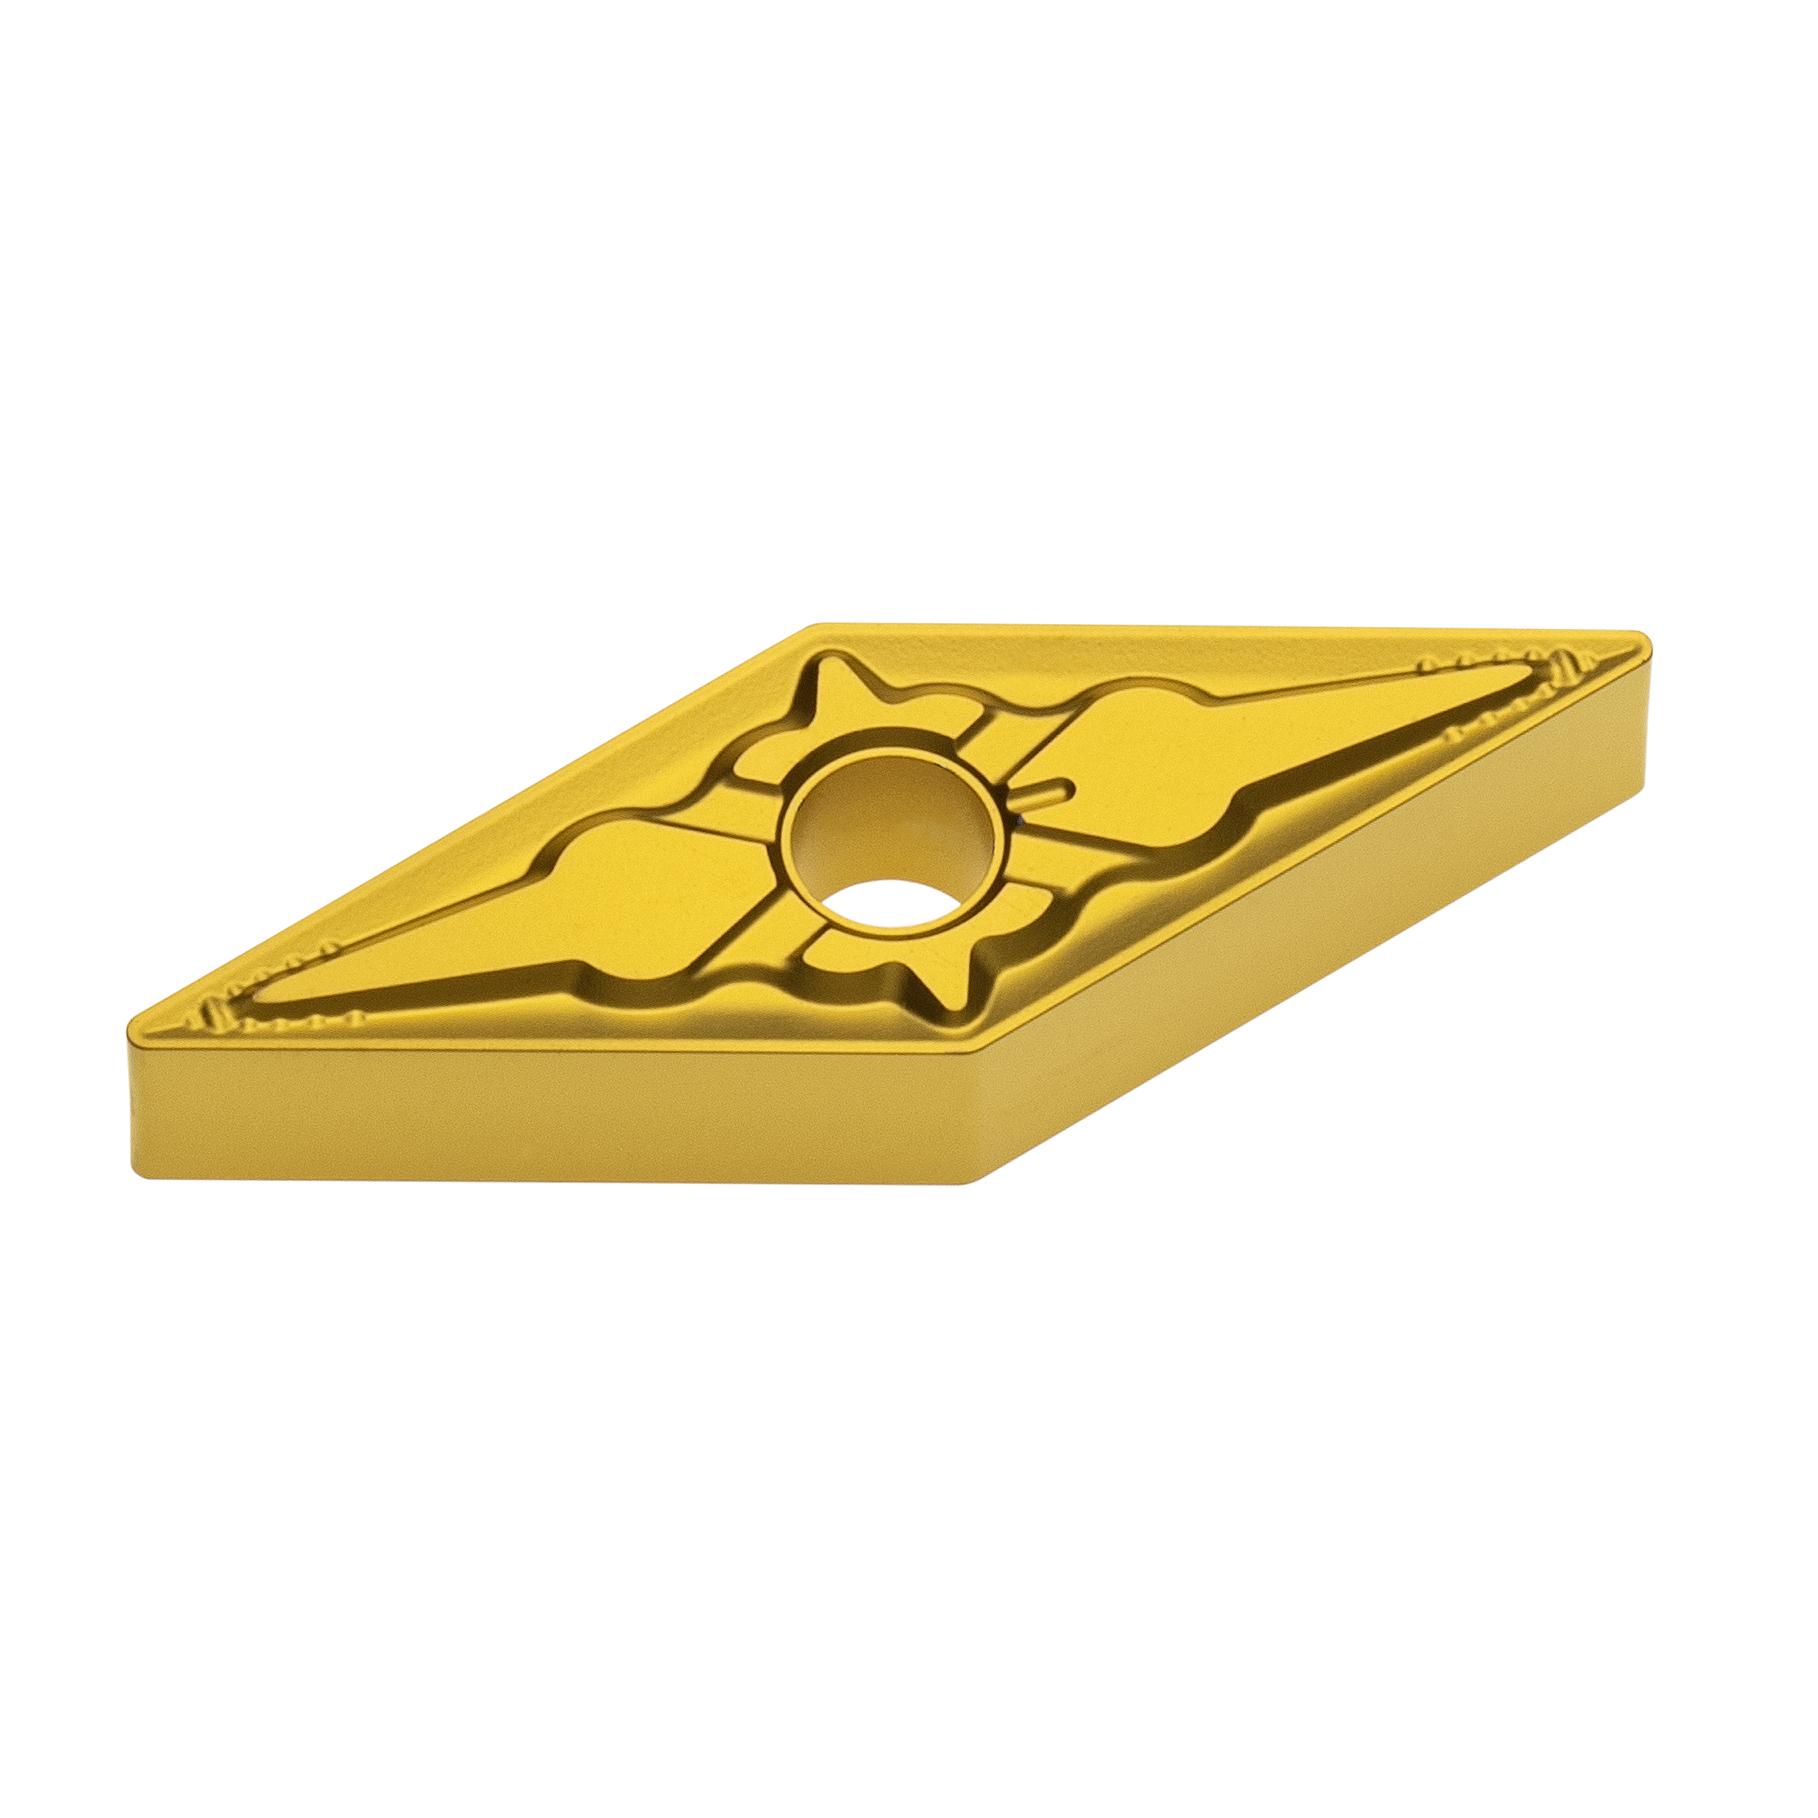 VNMG 160404 - PM4 -TP15CG für Stahl